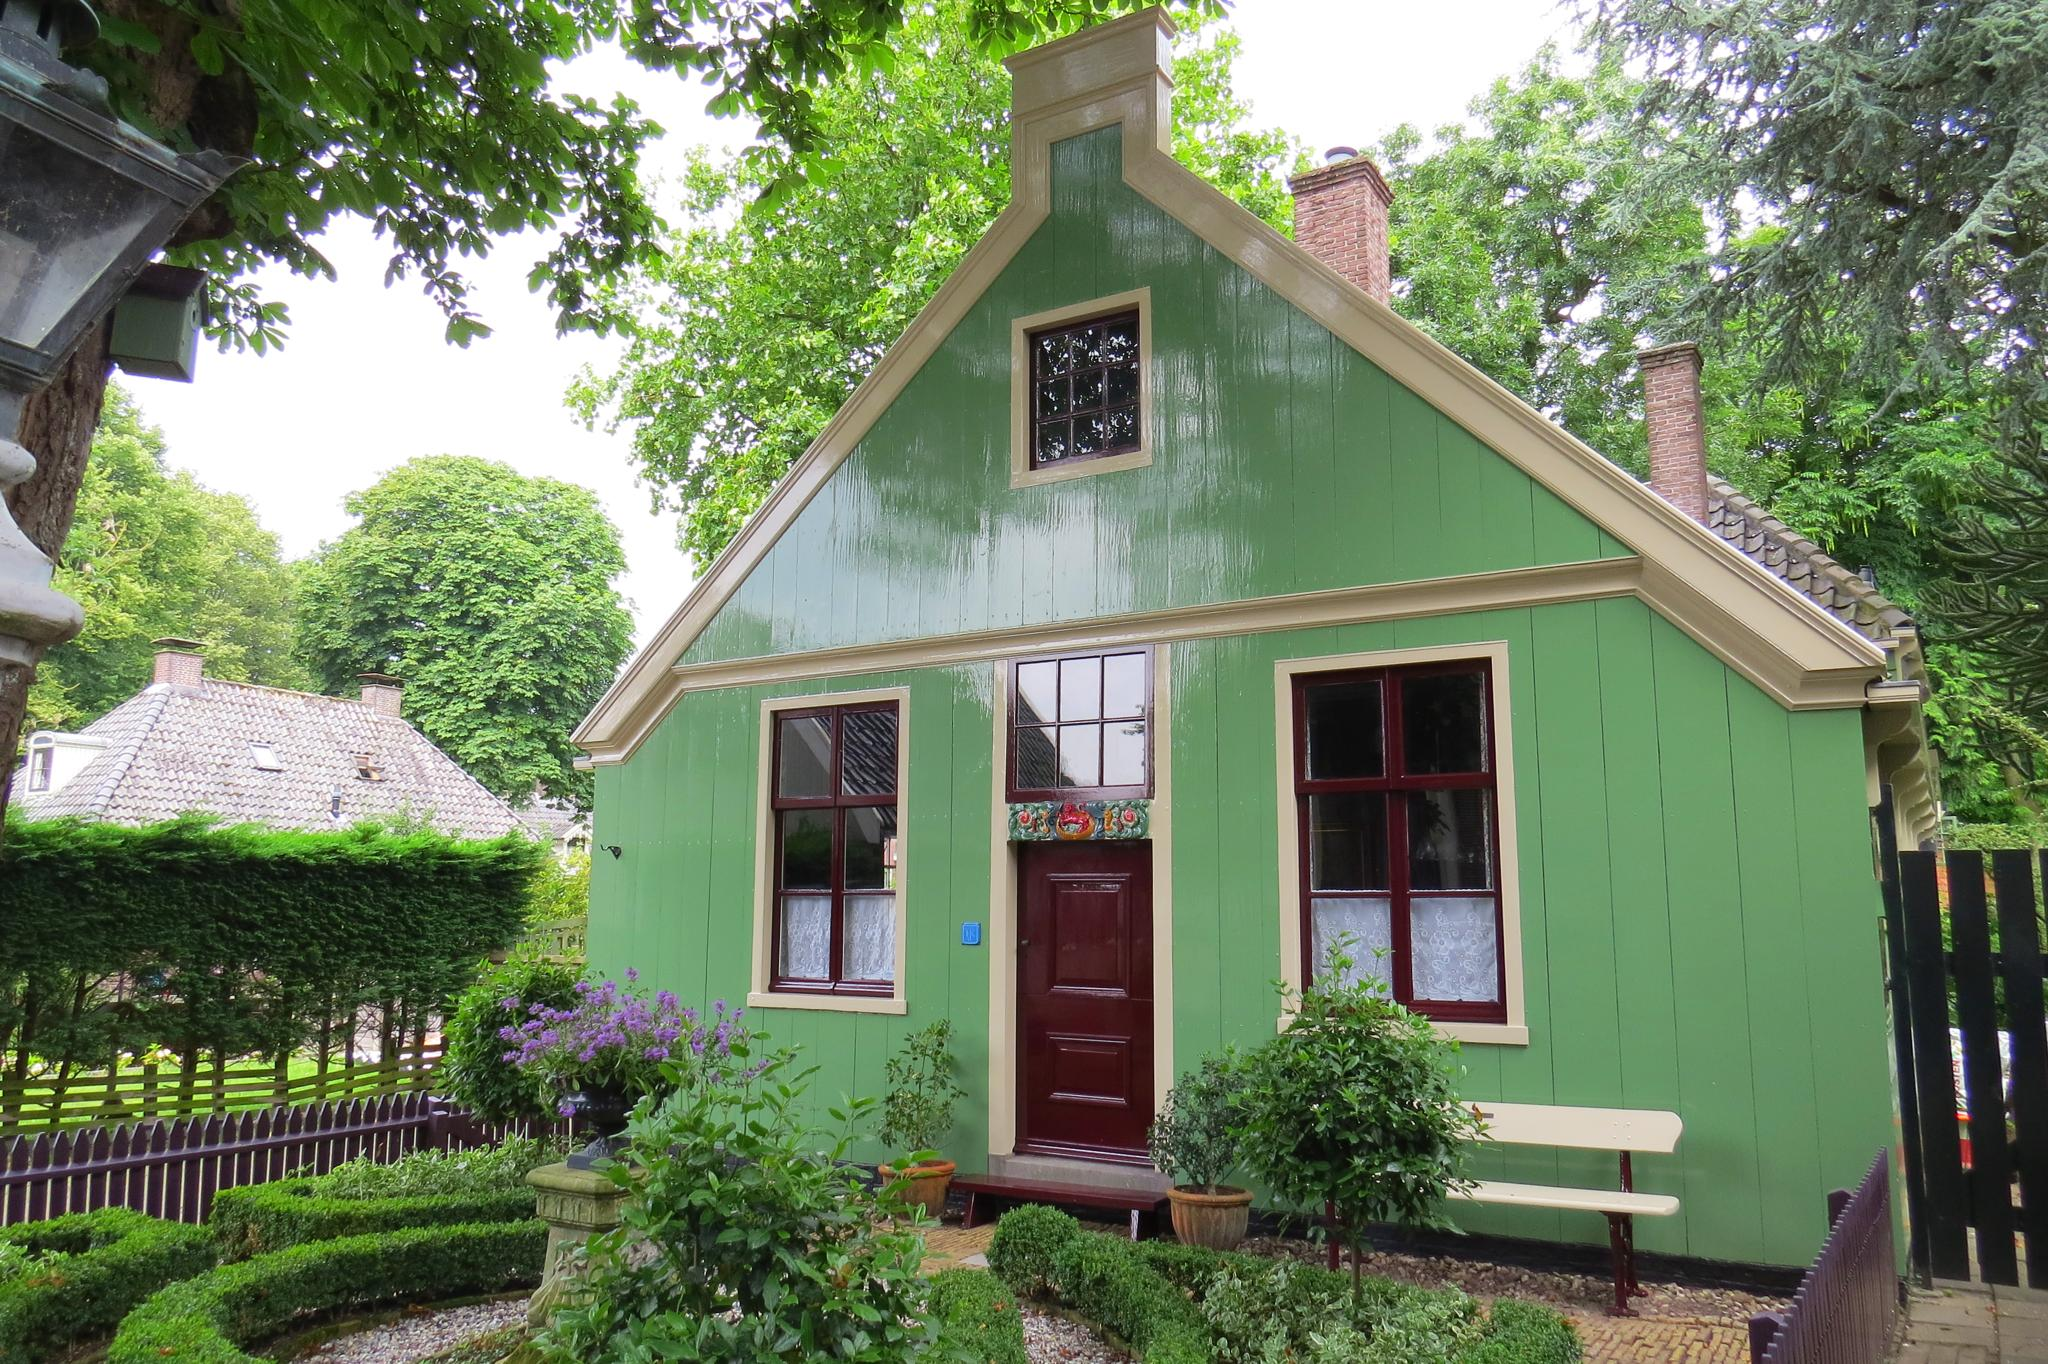 miasteczka w Holandii Broek